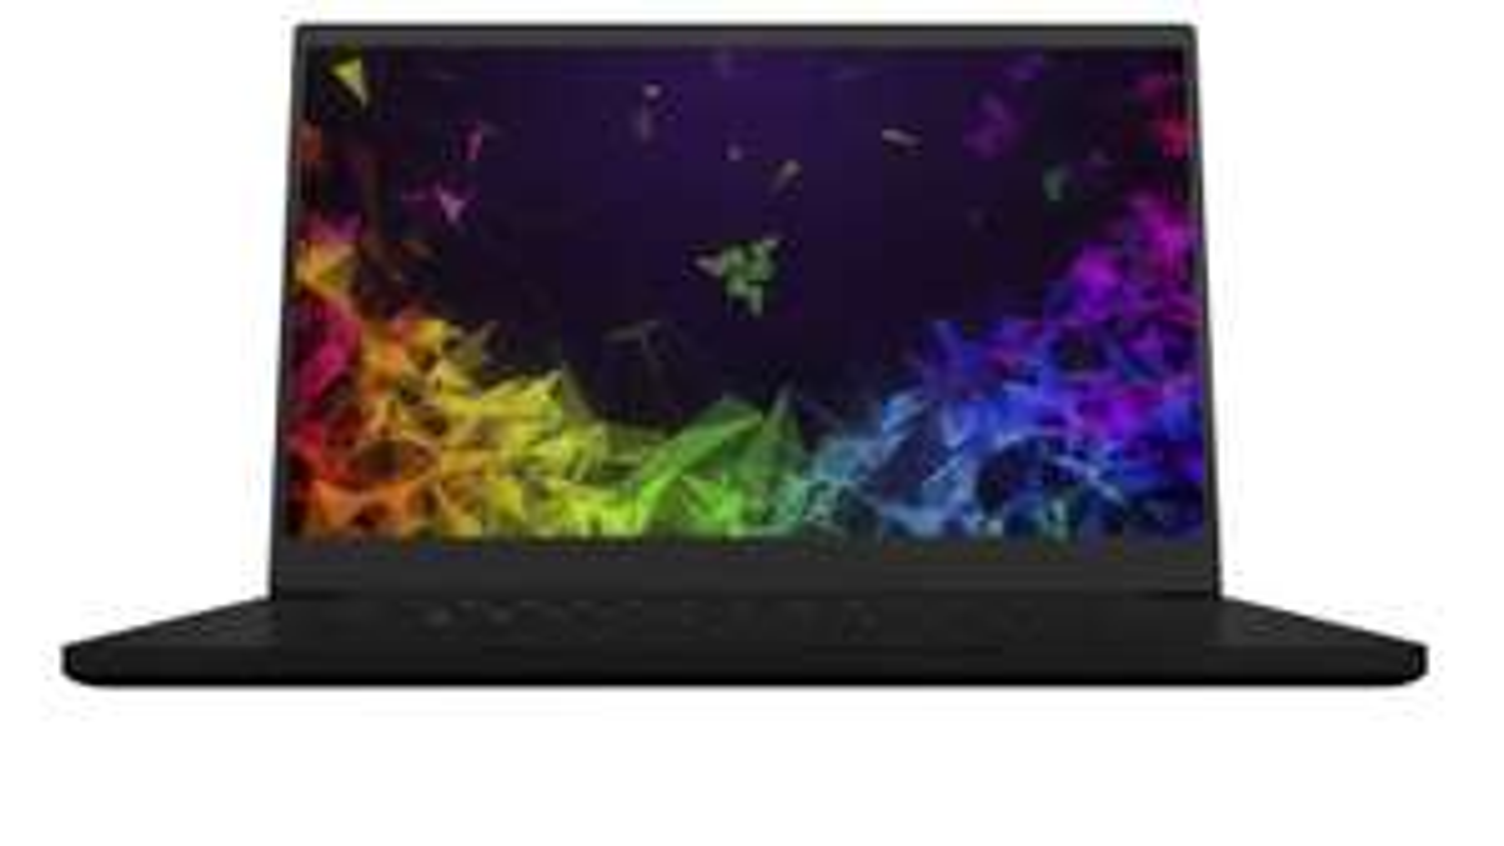 Razer Blade 15 Advanced Model 2019 - 15.6 Inch, 240 Hz Full HD Thin Bezel Display - Gaming Notebook £1,836.18 at Amazon